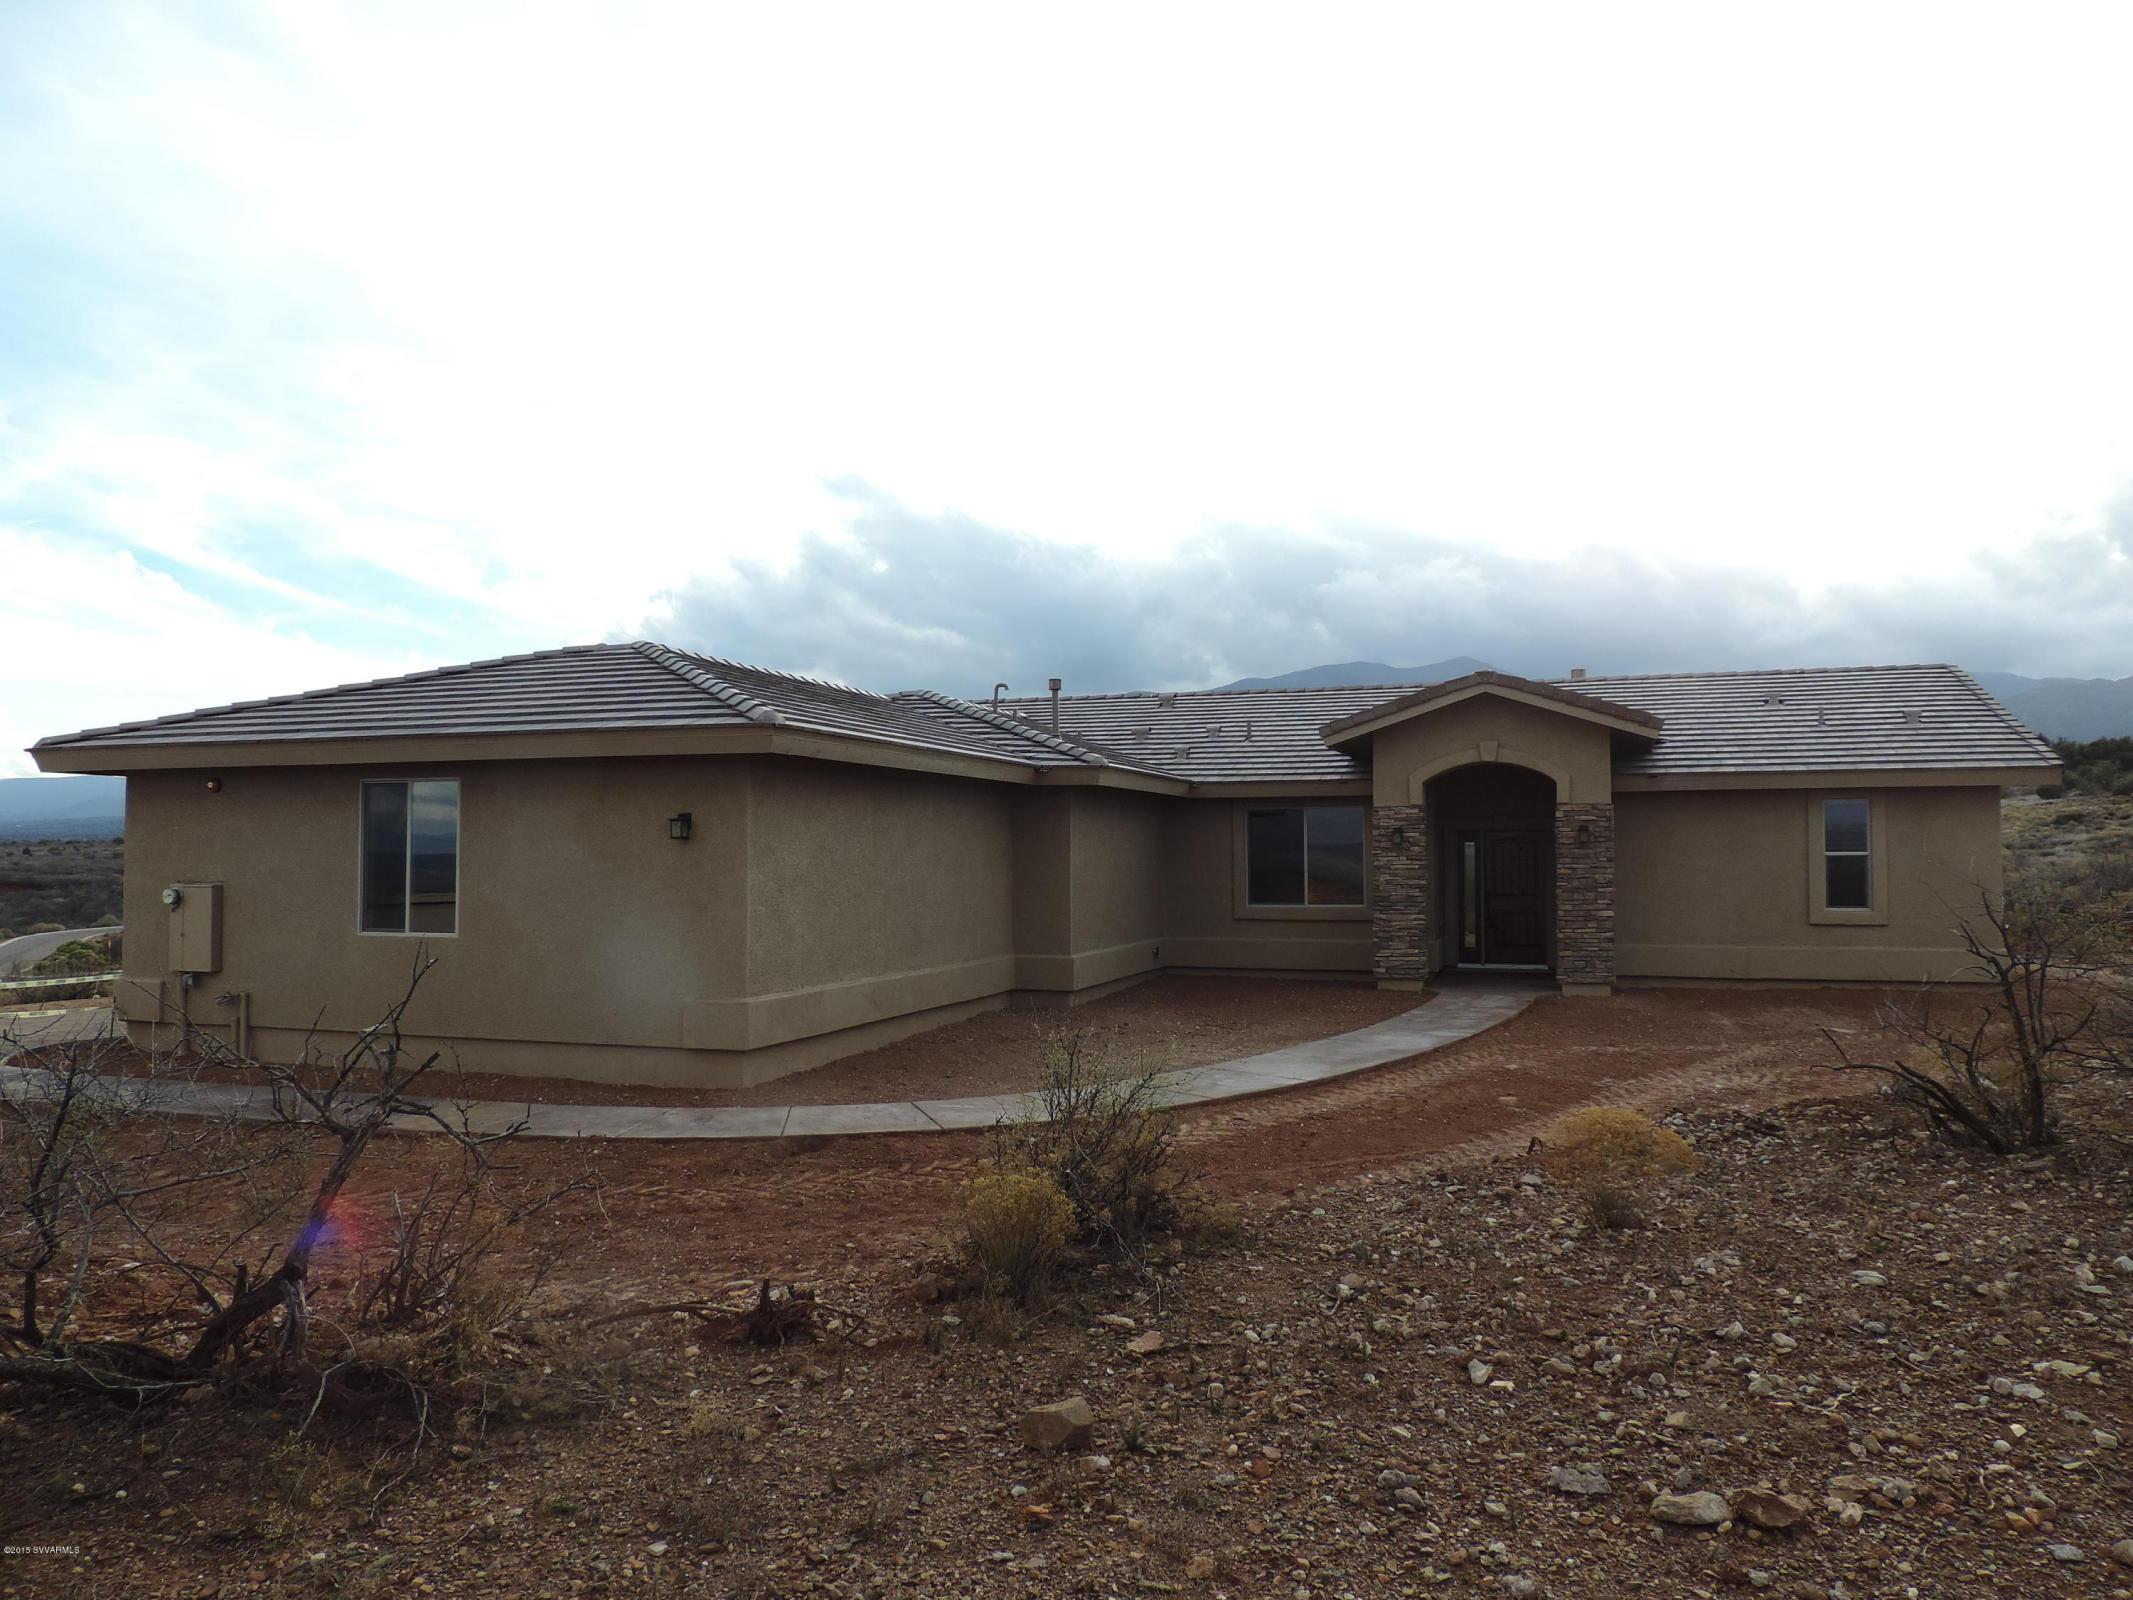 2860 S QUAIL CANYON ROAD, Cottonwood, Arizona 86326